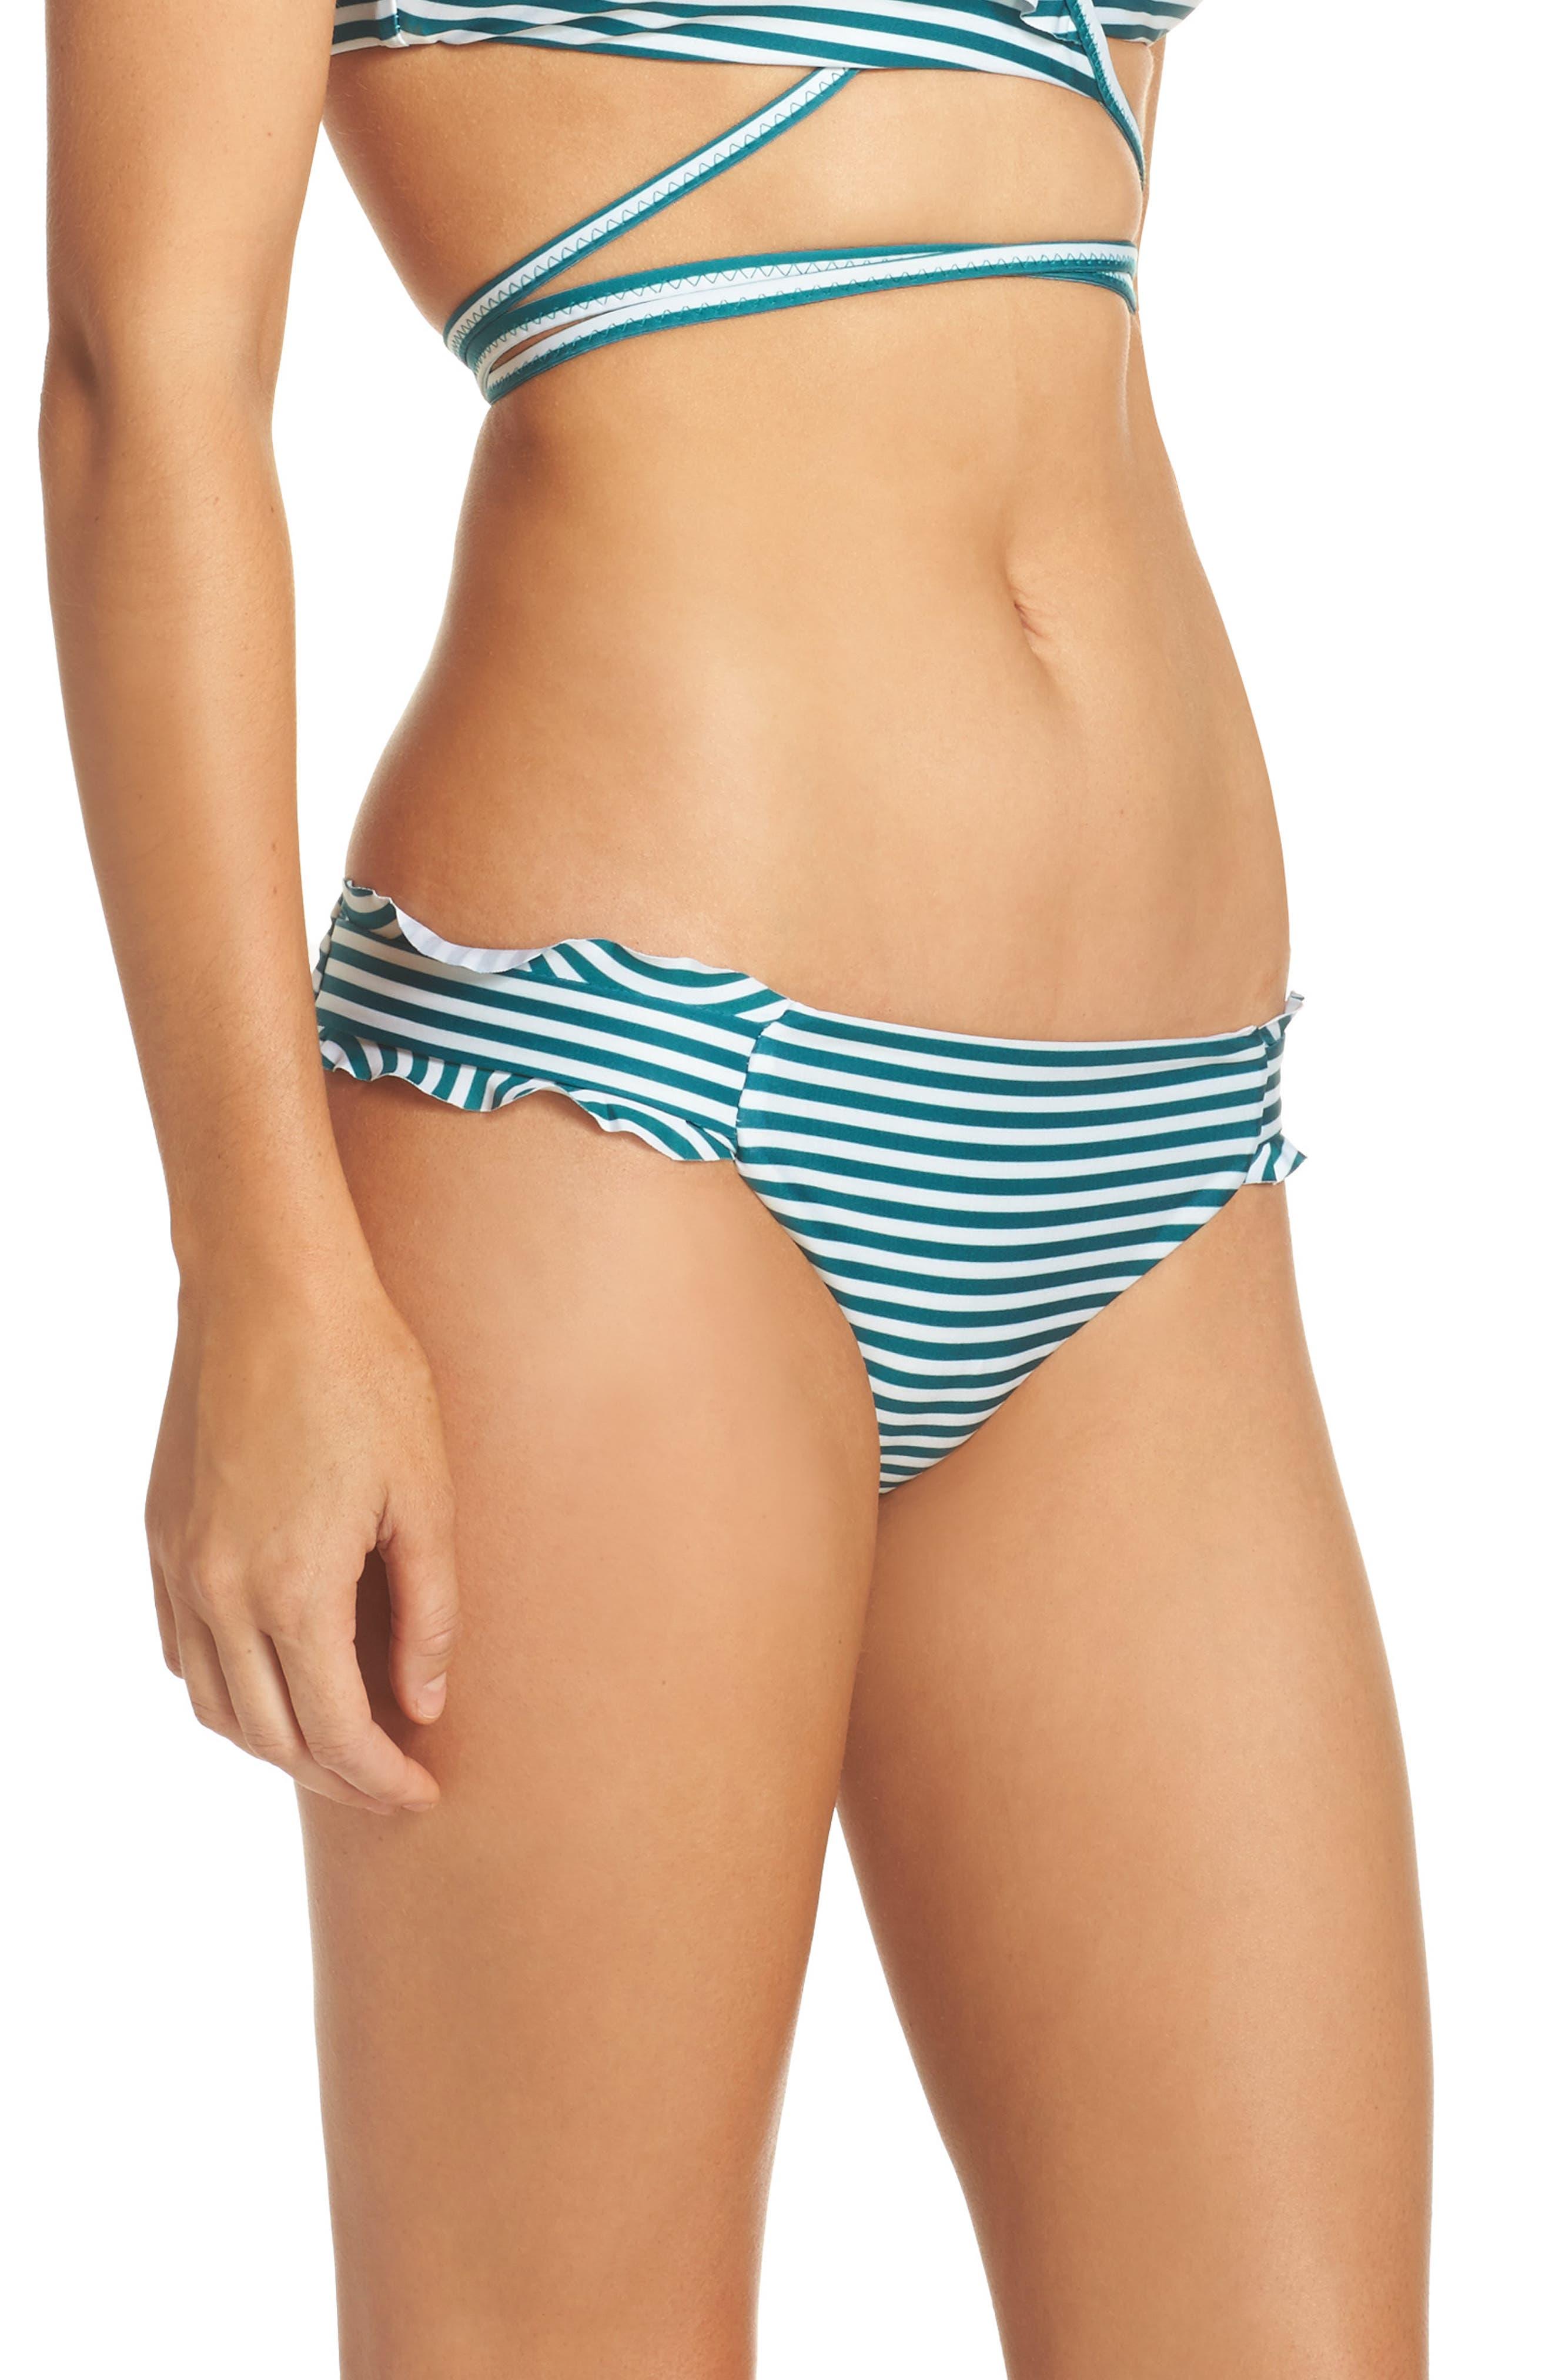 Avalon Ruffle Bikini Bottoms,                             Alternate thumbnail 3, color,                             001